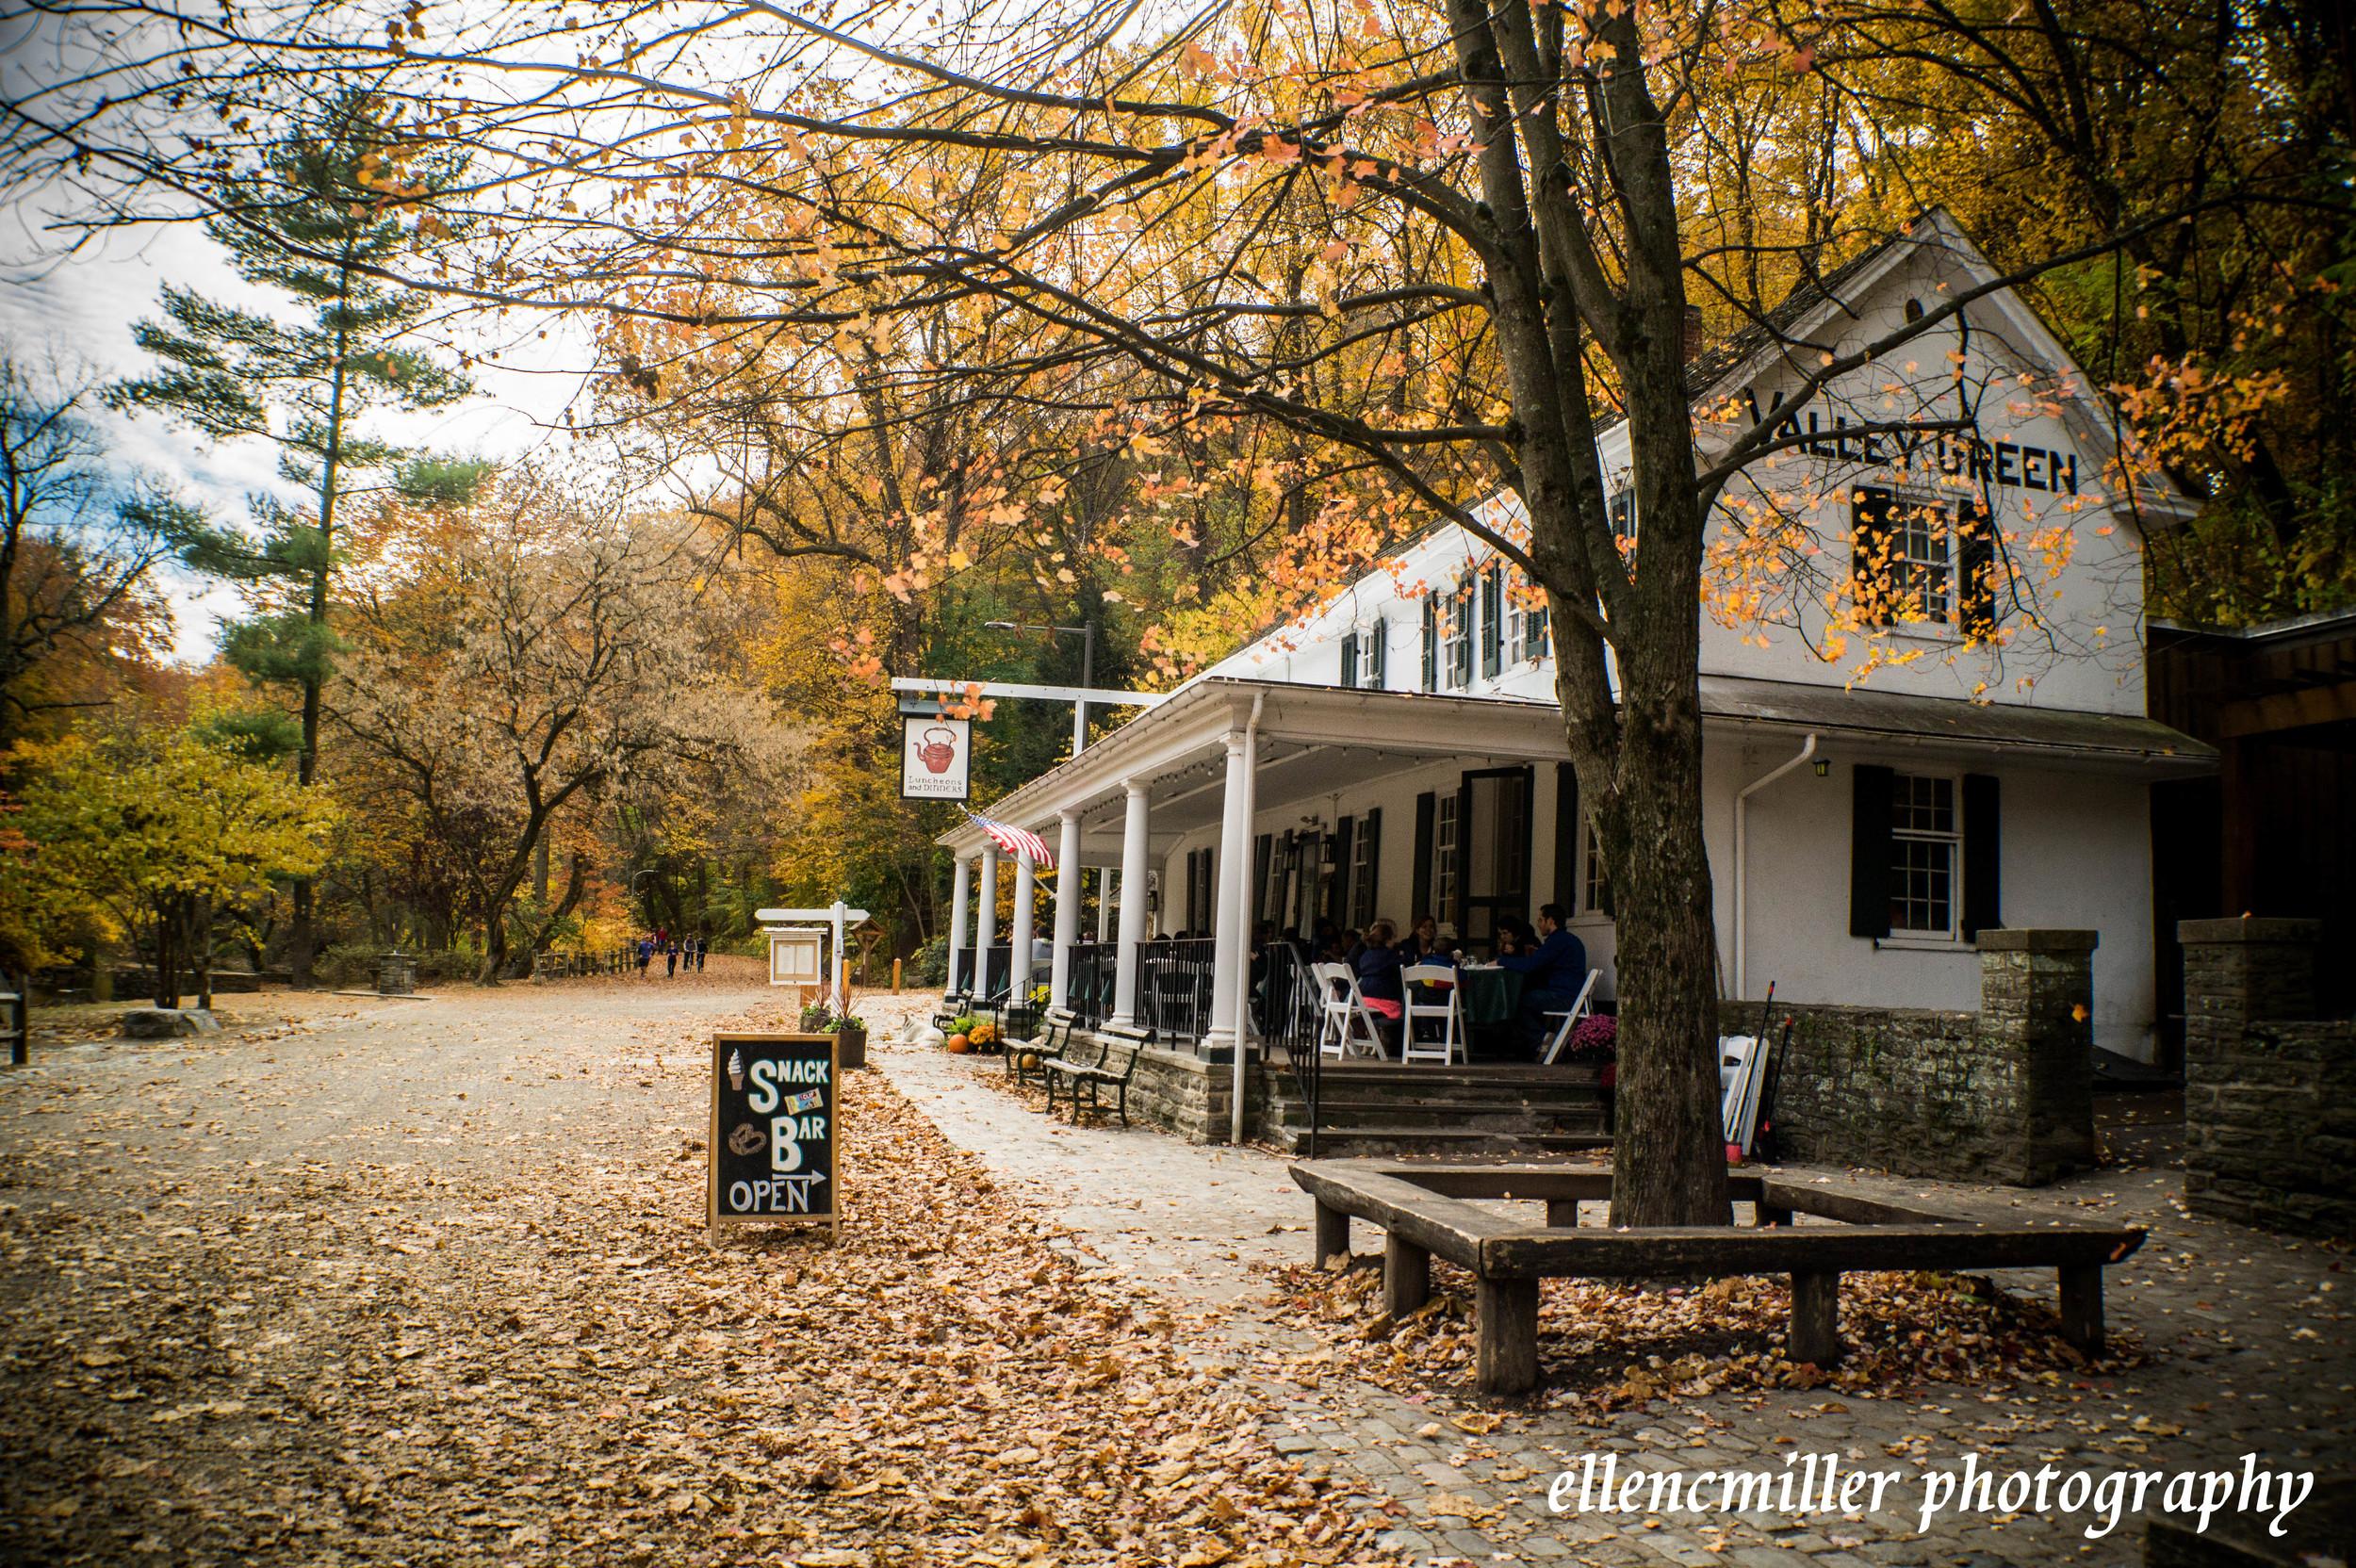 Valley Green Inn